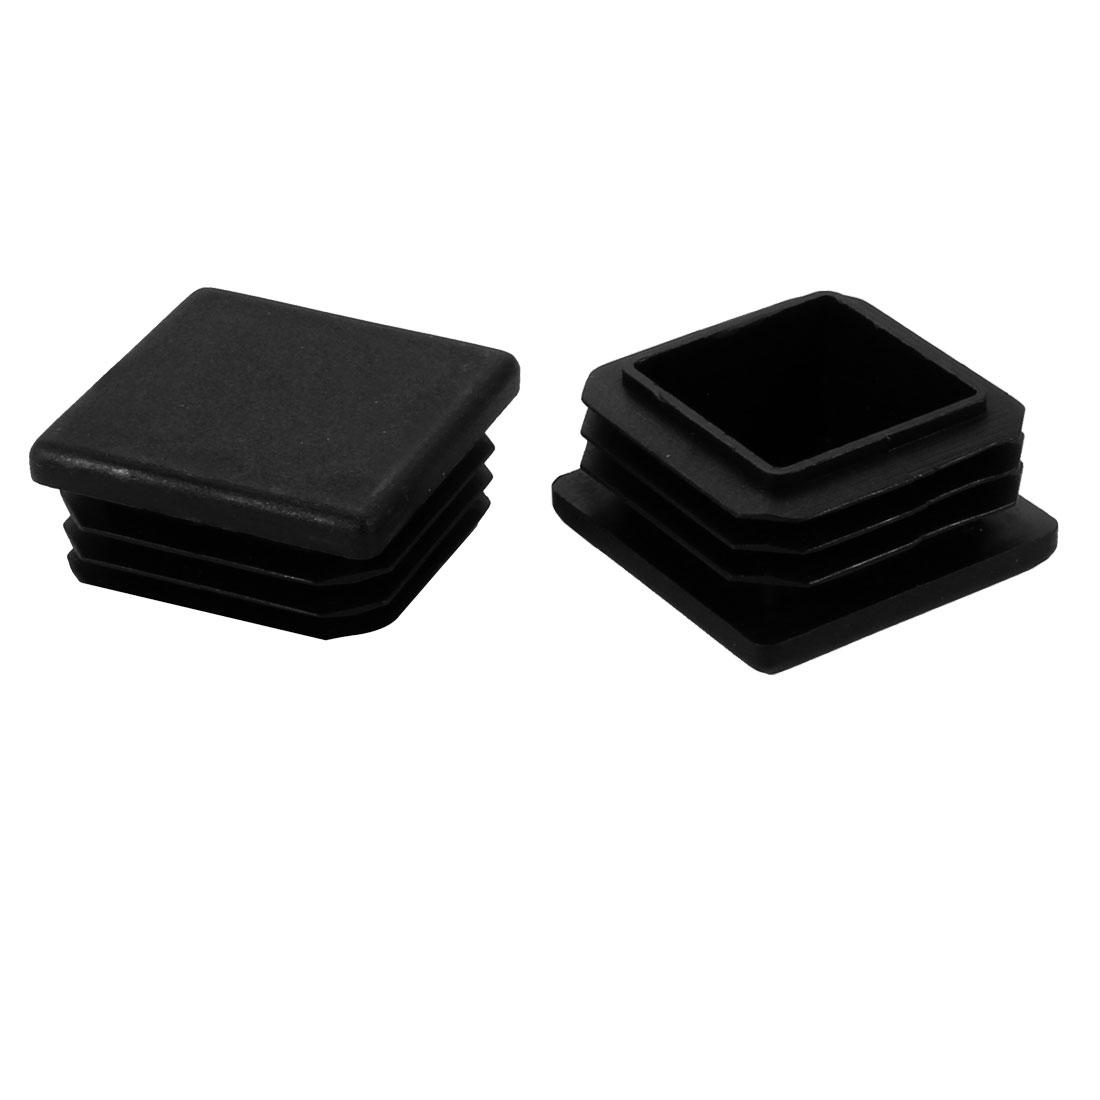 2pcs 35mm x 35mm Pipe Tube Insert Chair Leg Cap Black Plastic Tubing Plug